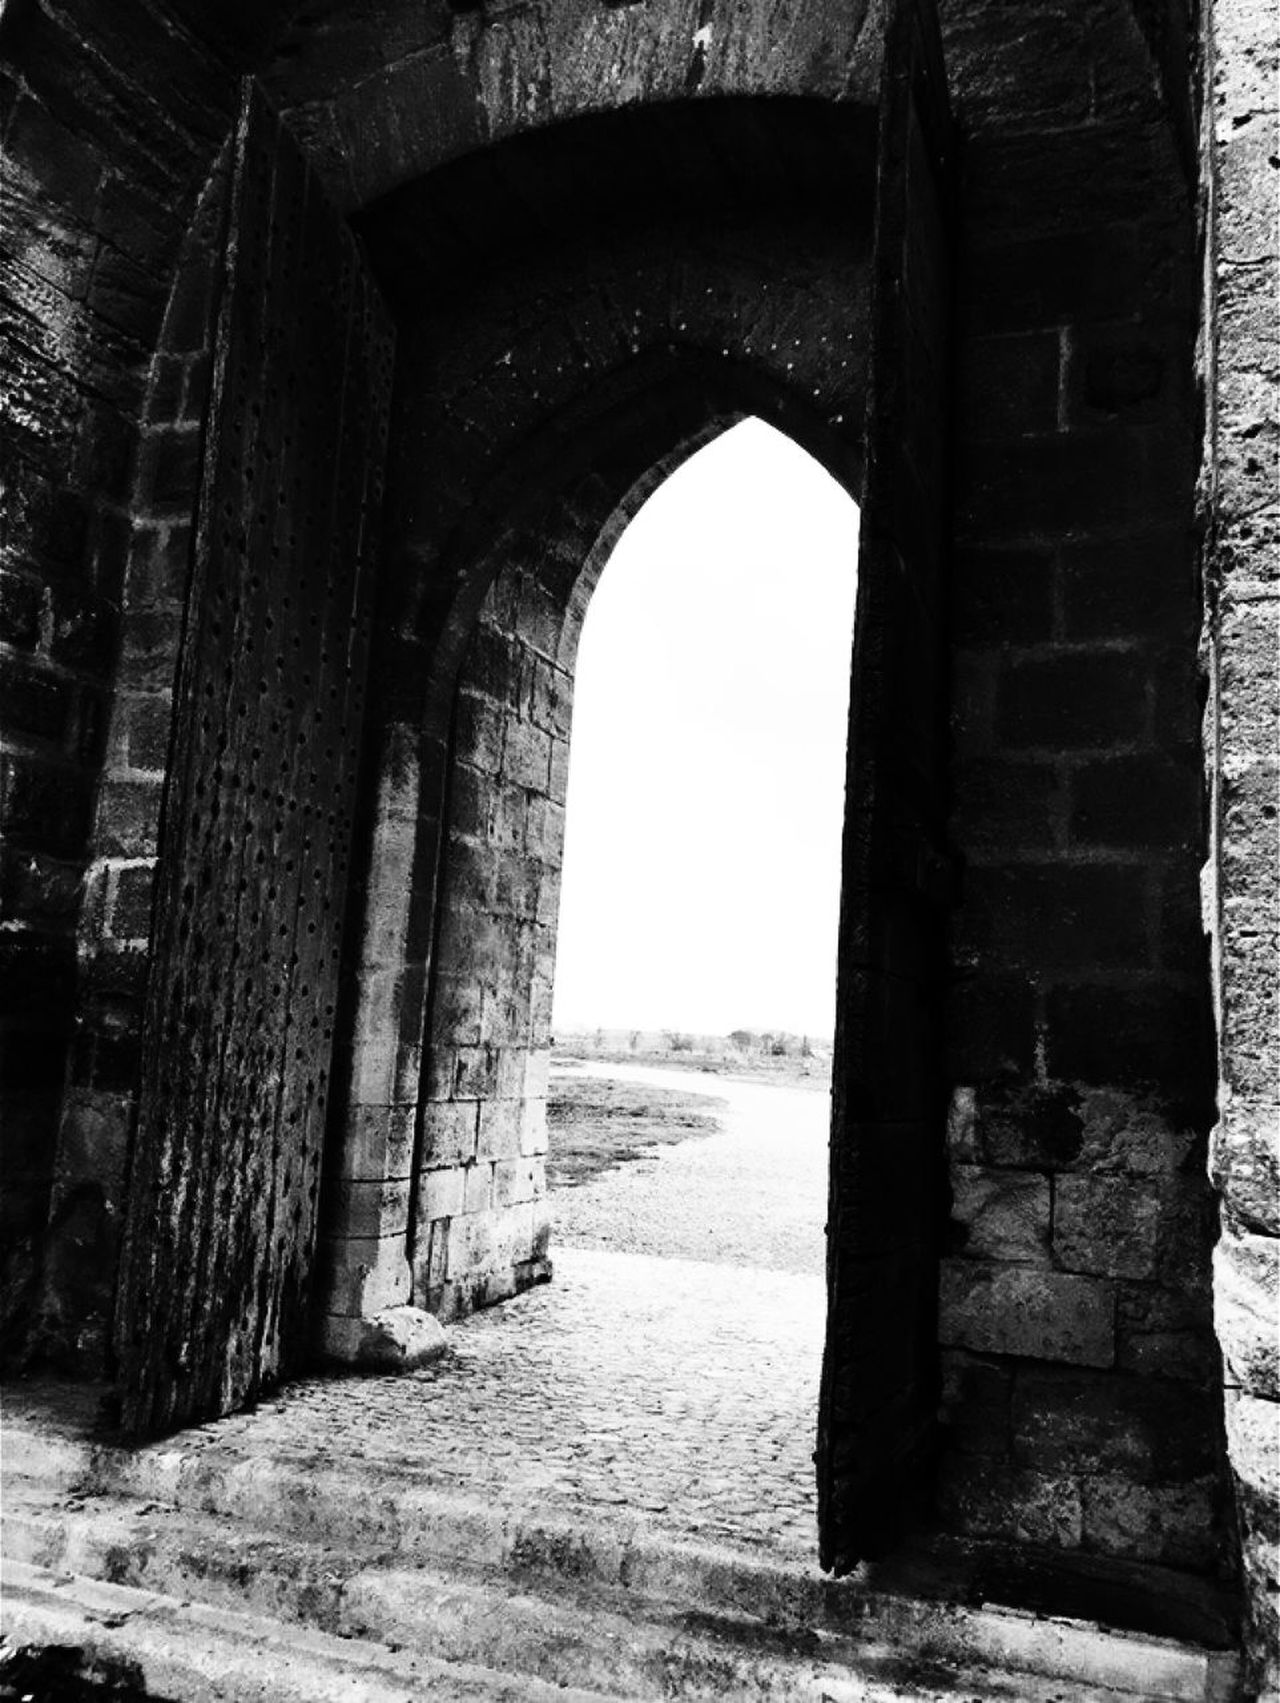 Architecture Built Structure Arch Day History No People Outdoors Sky avant, la mer arrivait ici…